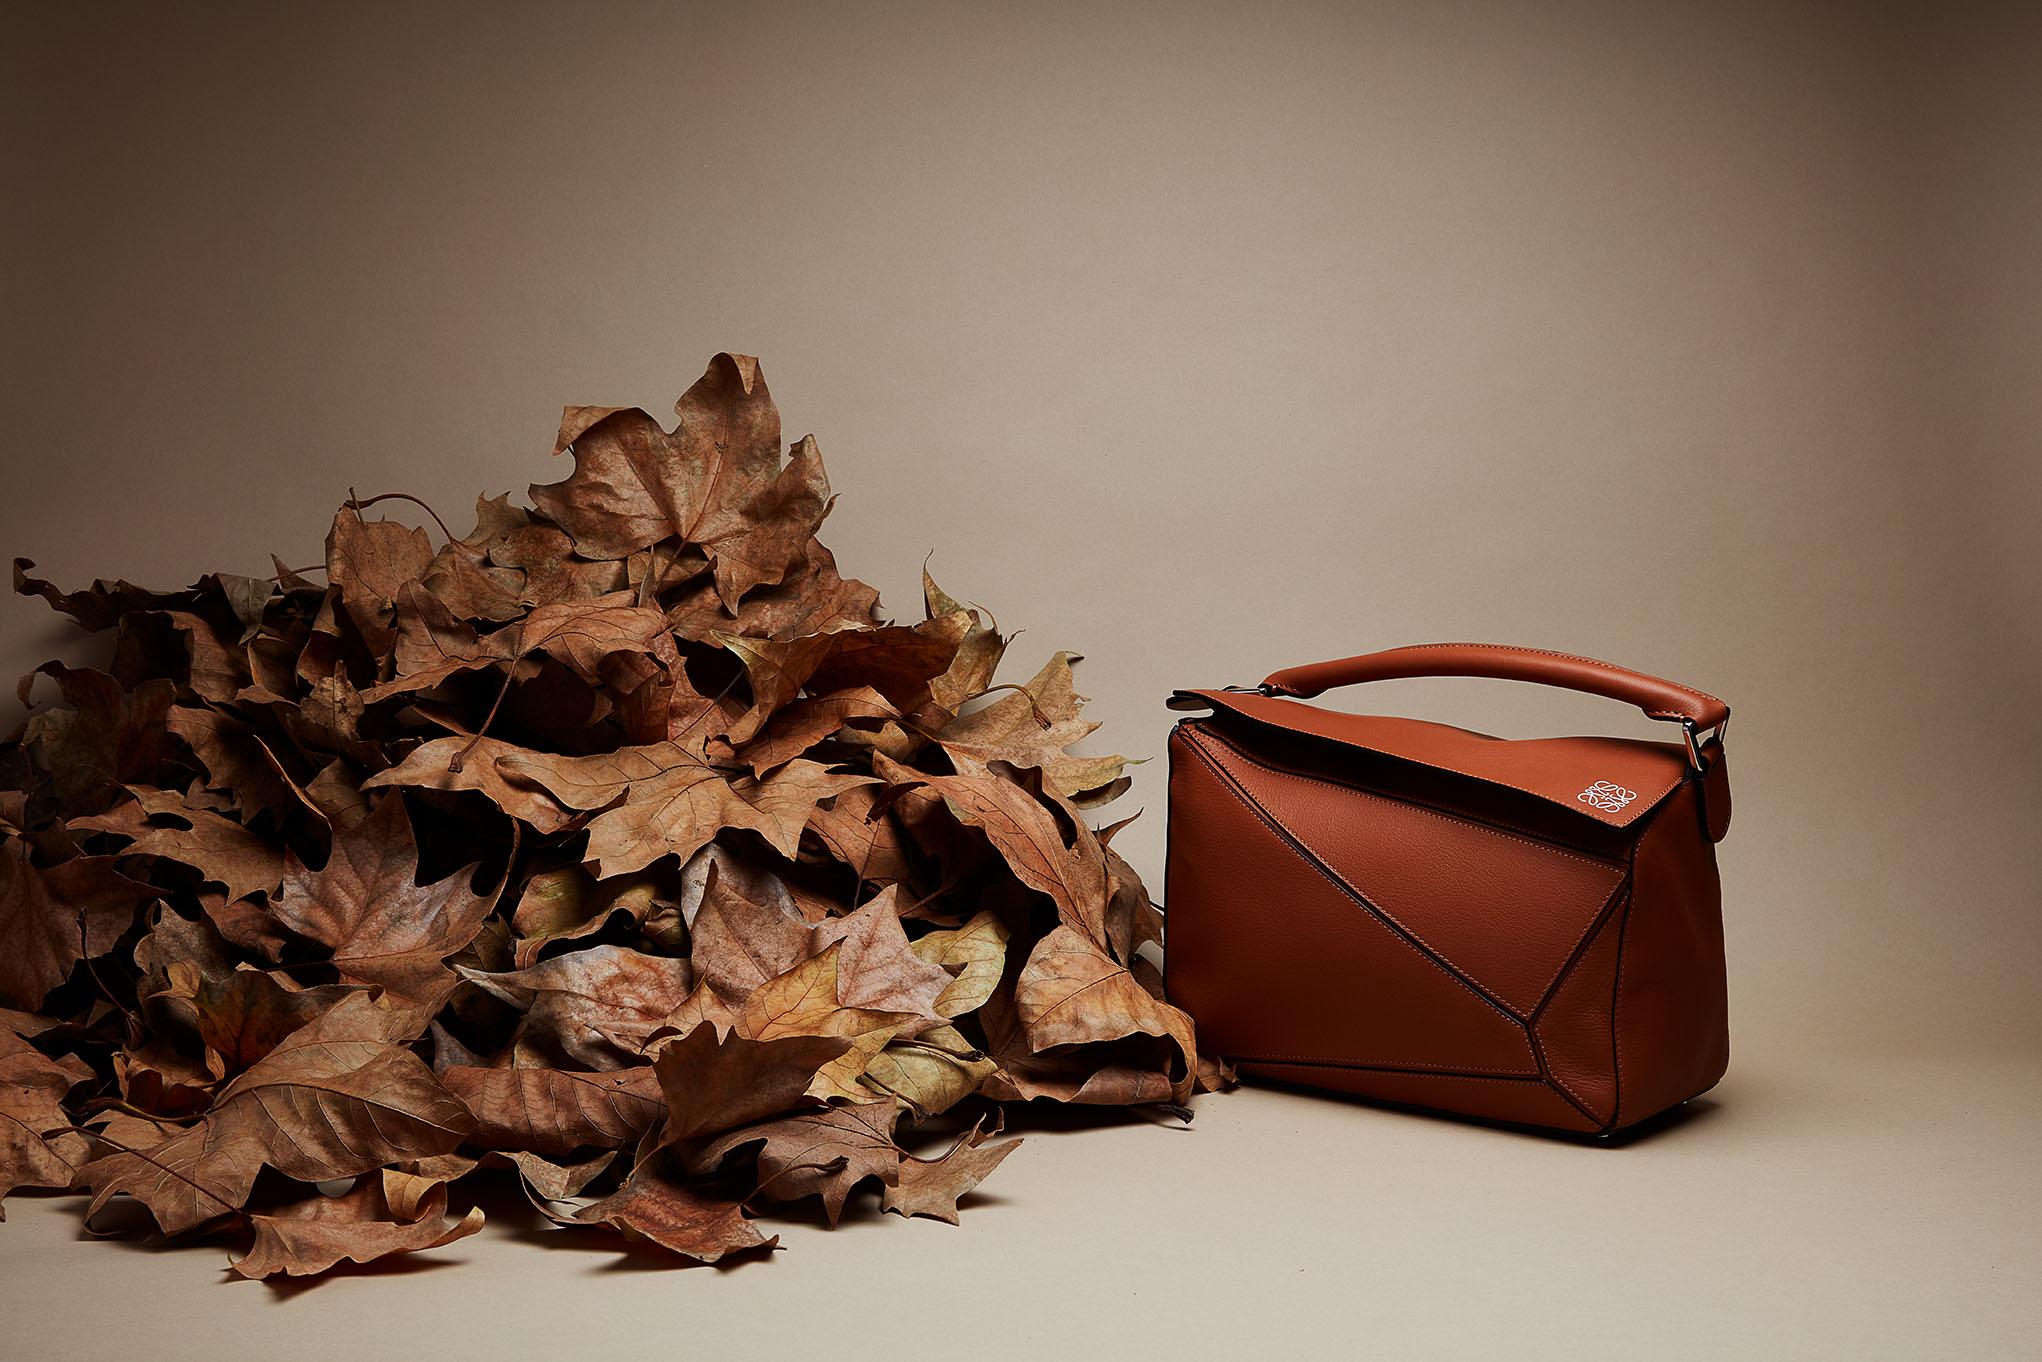 Maroquinerie d'automne : Loewe